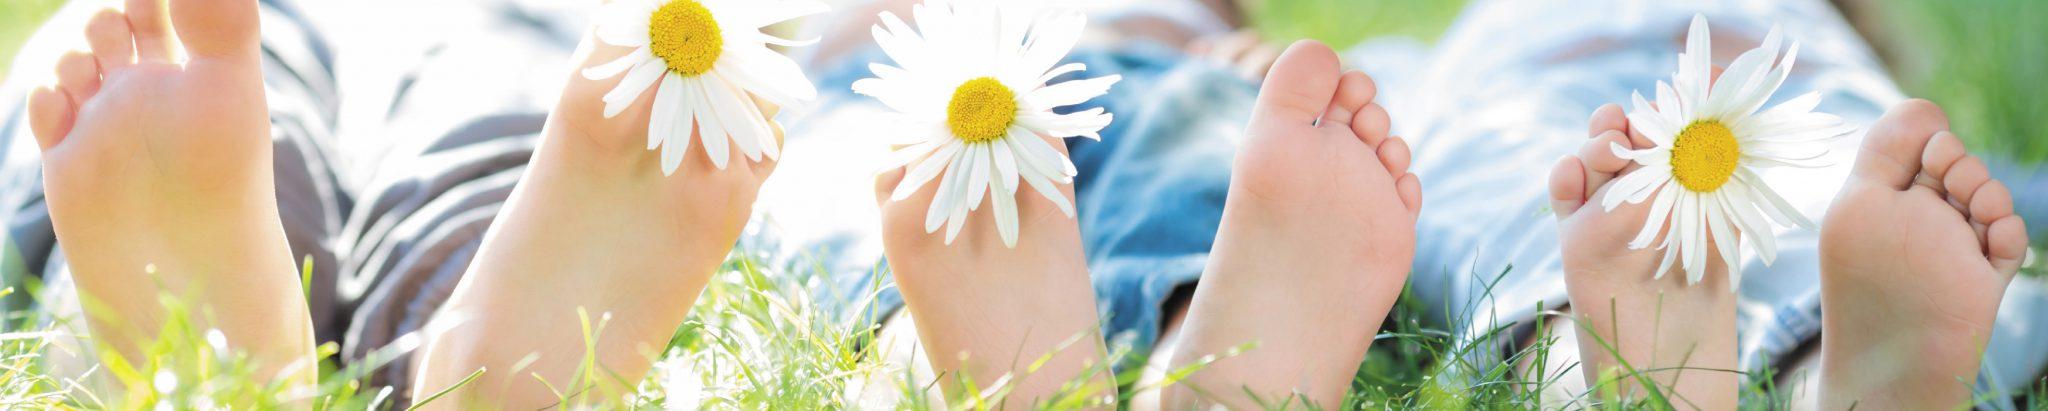 siddha remedies for kids